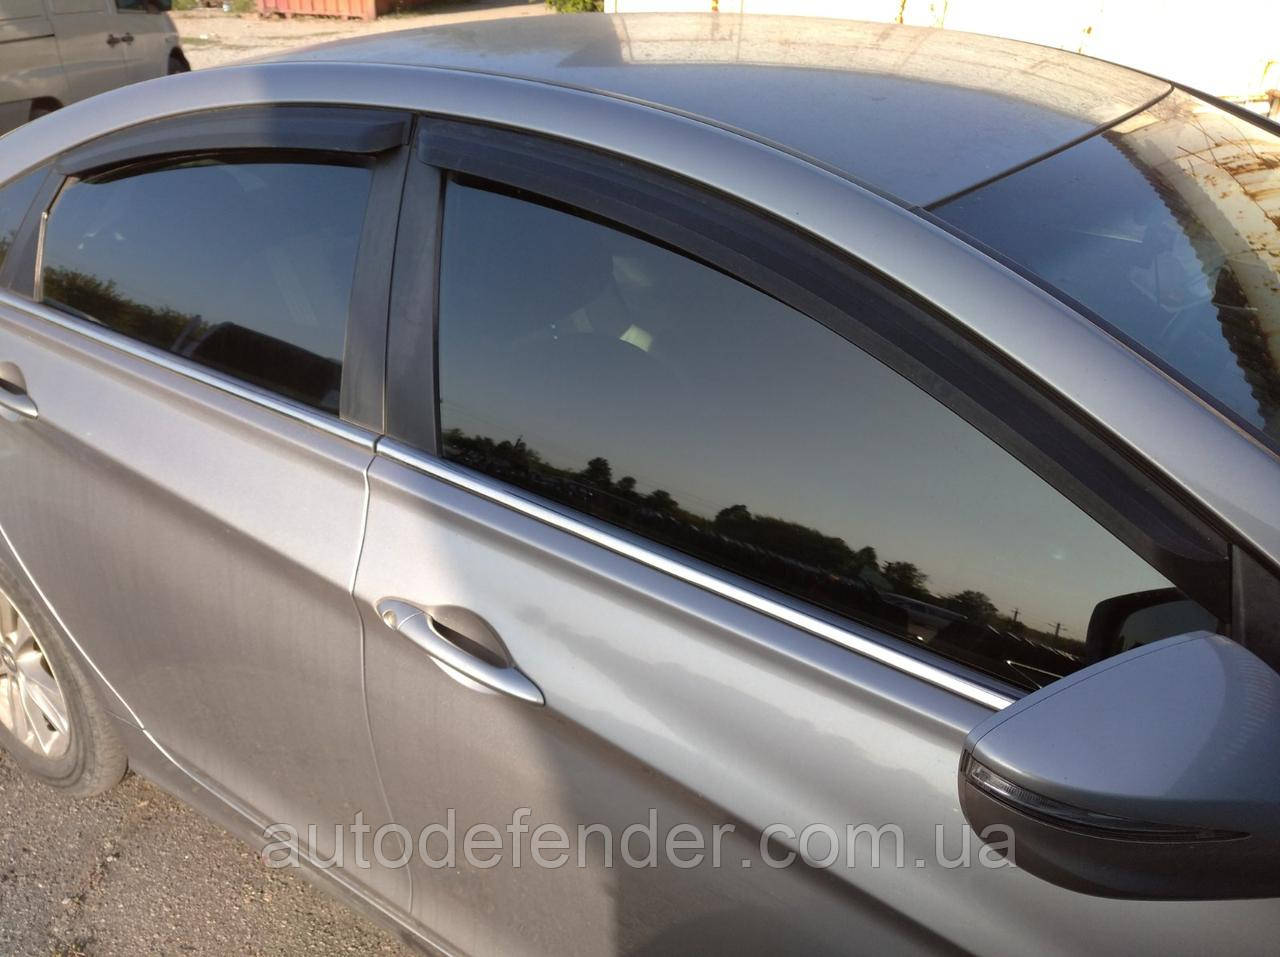 Дефлекторы окон (ветровики) Hyundai Sonata LF sedan 2014-, Cobra Tuning - VL, H25917